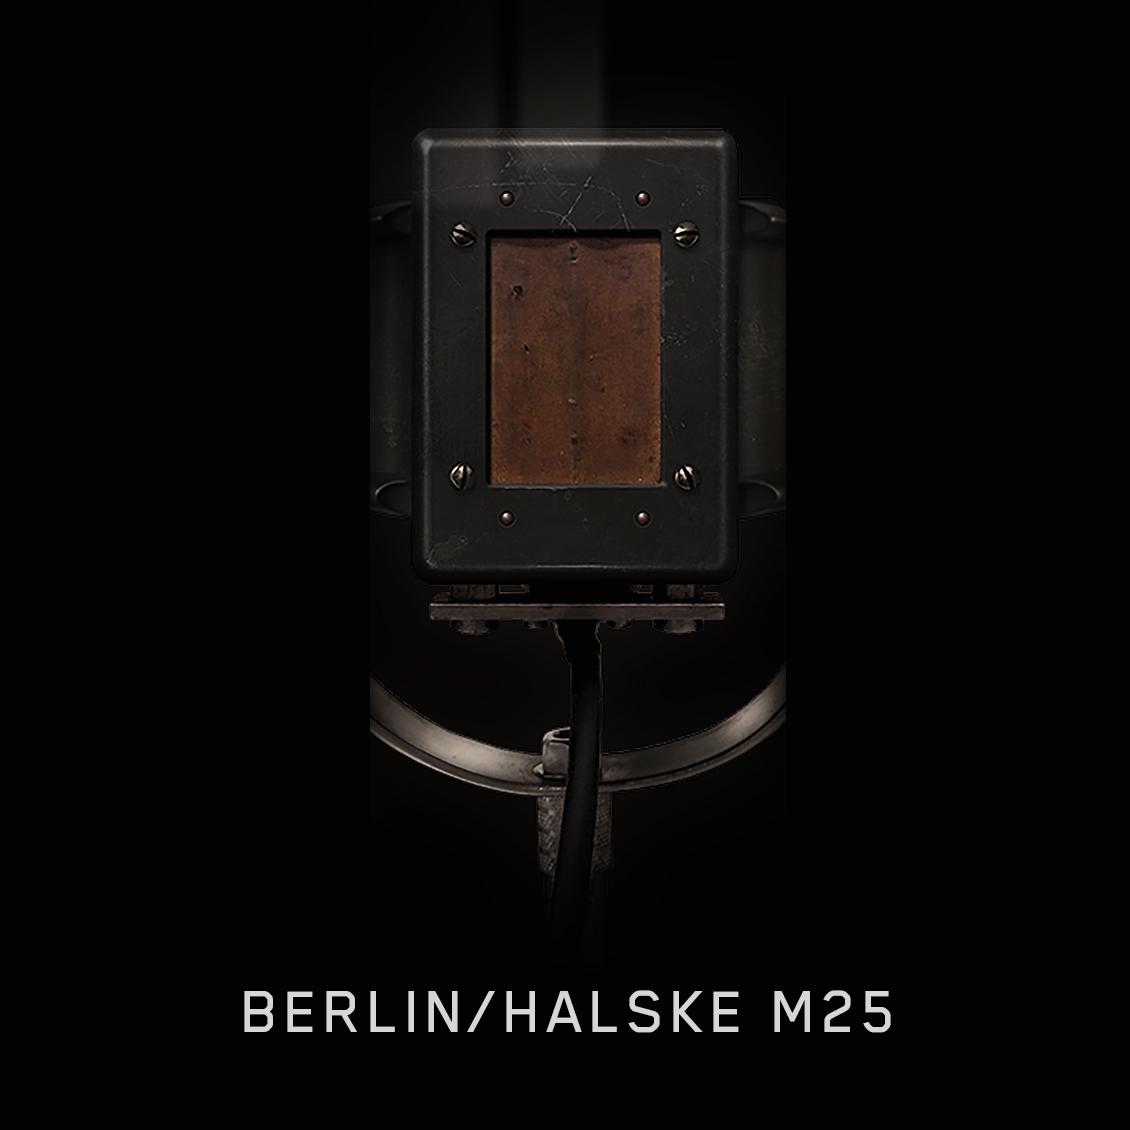 BerlinHalske M25 1